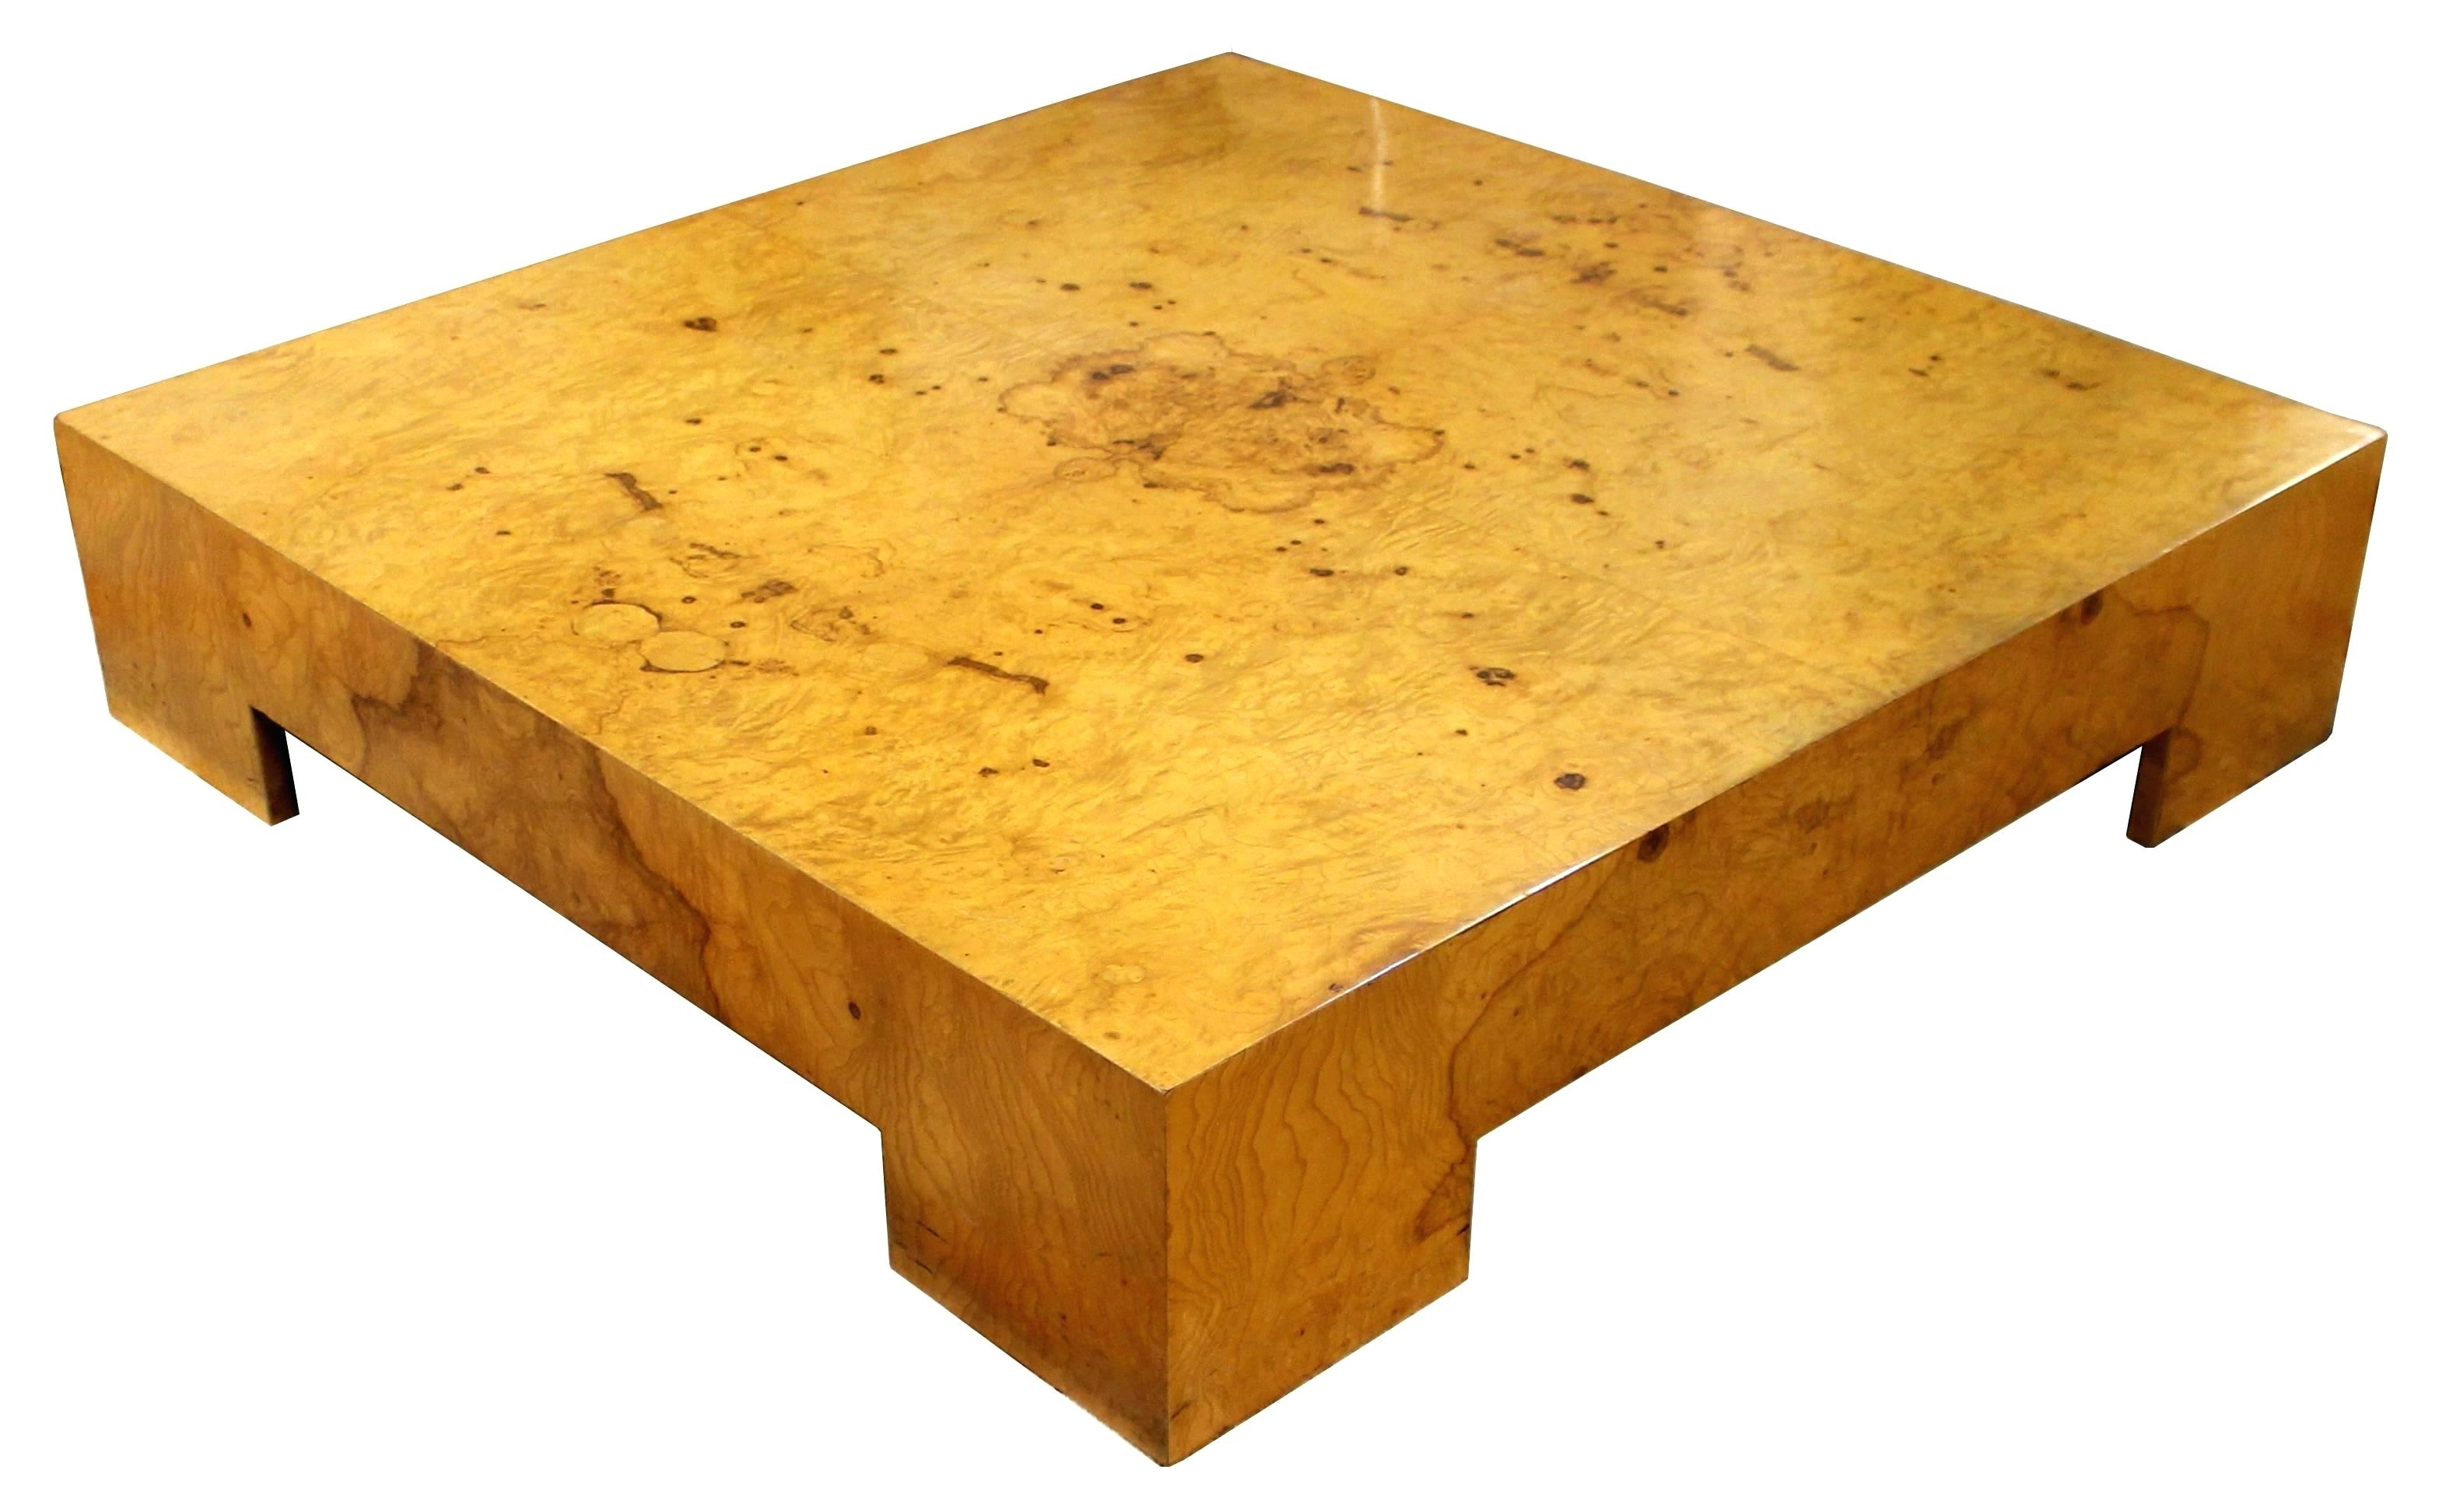 Burled Wood Coffee Table Wisteria Oslo Burl Wood Veneer Collection For Fashionable Oslo Burl Wood Veneer Coffee Tables (View 6 of 20)